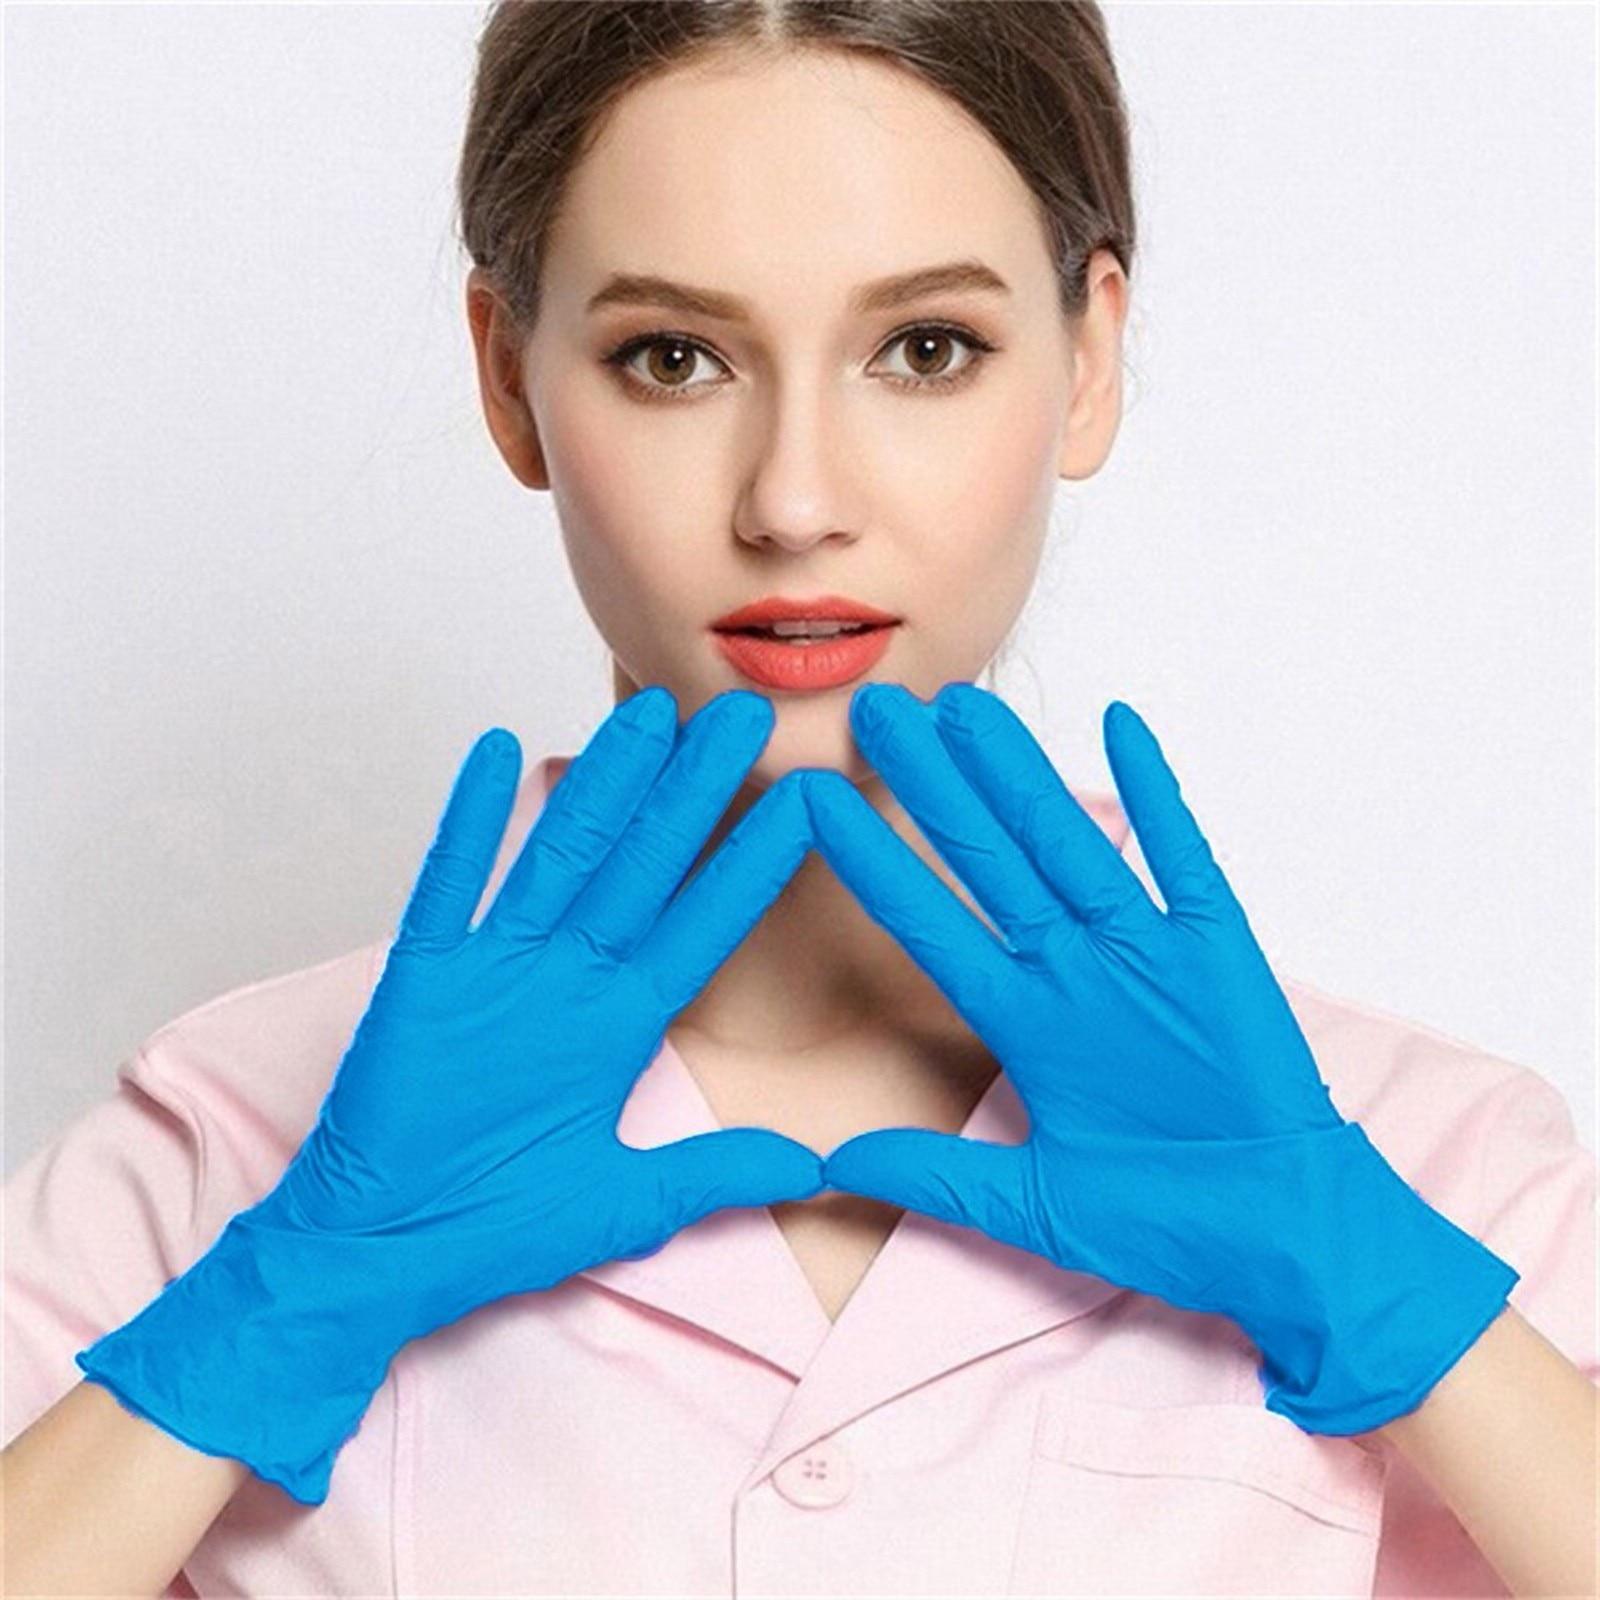 Blue Disposable Latex Gloves Dishwashing Kitchen Work Rubber Garden Gloves Disposable Gloves Guantes